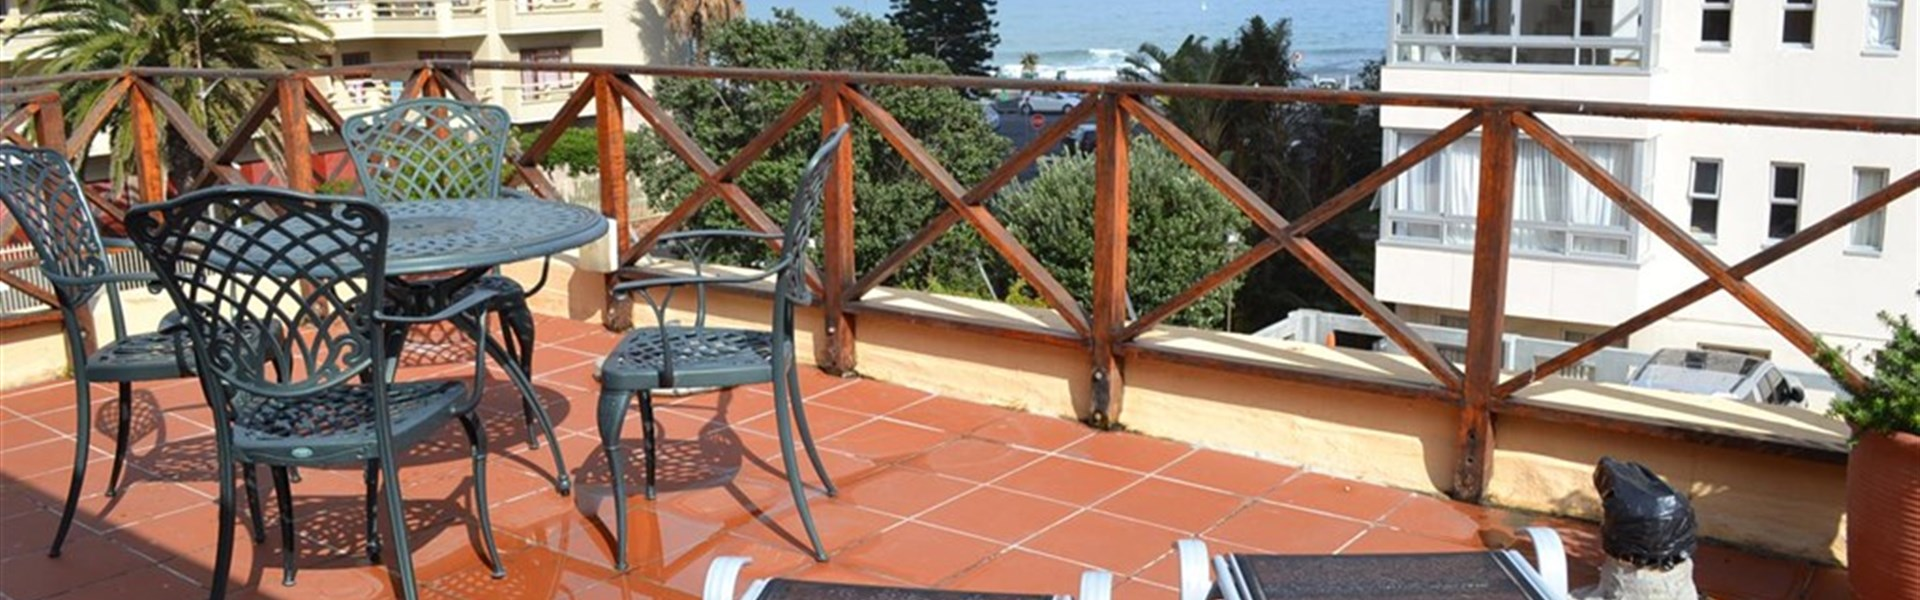 Marco Polo - Greenfire Lodge Cape Town - Greenfire Lodge Kapské Město - terasa penthouse